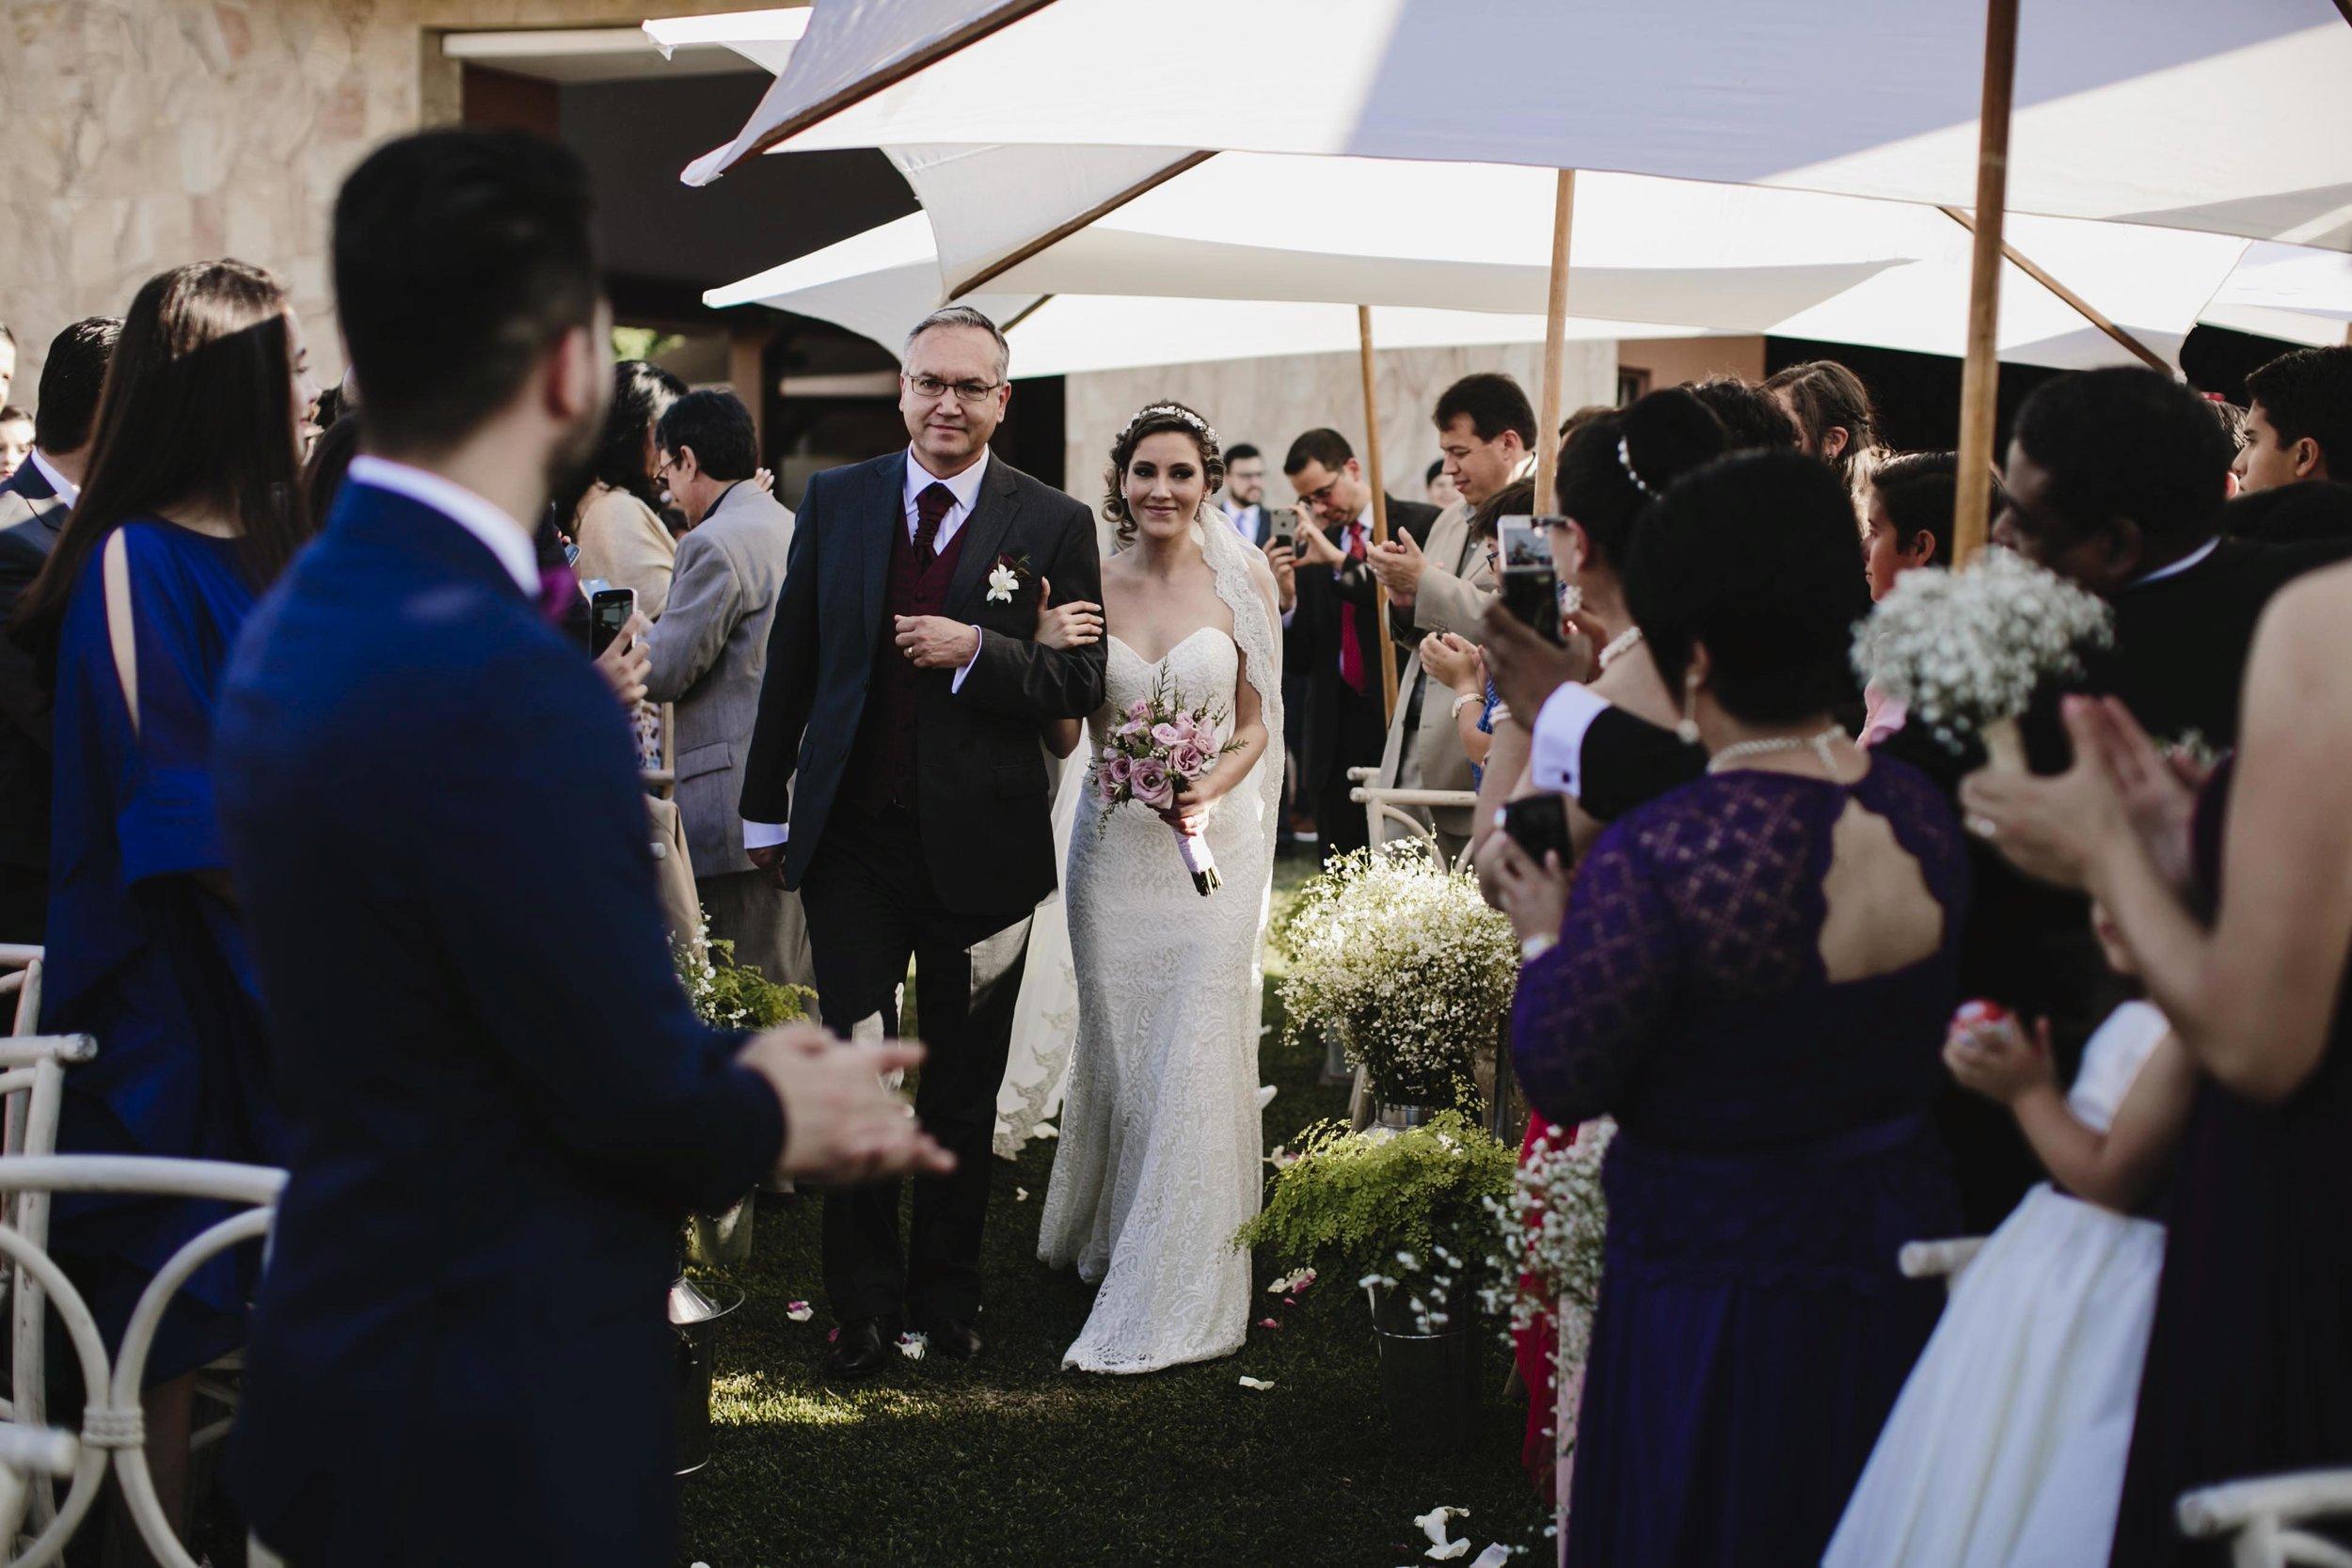 alfonso_flores_destination_wedding_photography_jardin_amarello_cuernavaca75.jpg